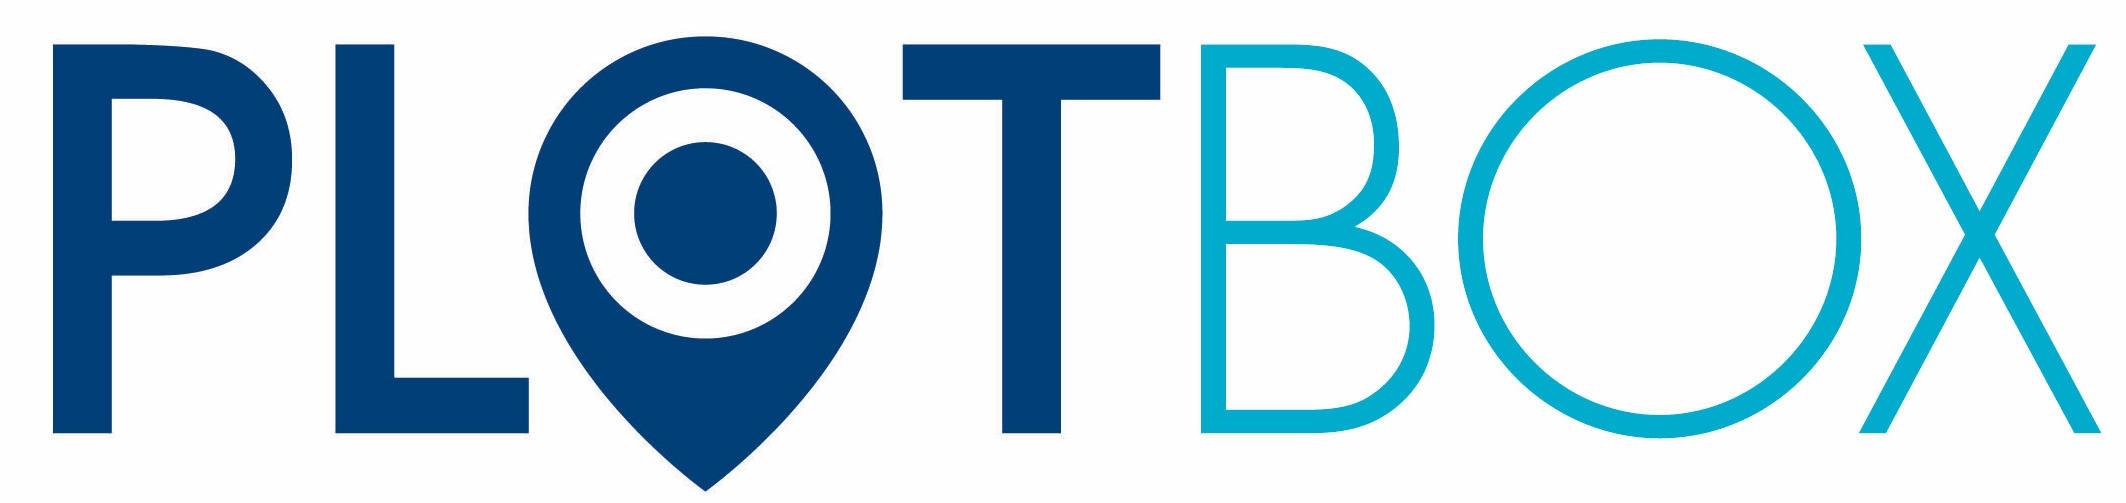 PlotBox Logo 2018